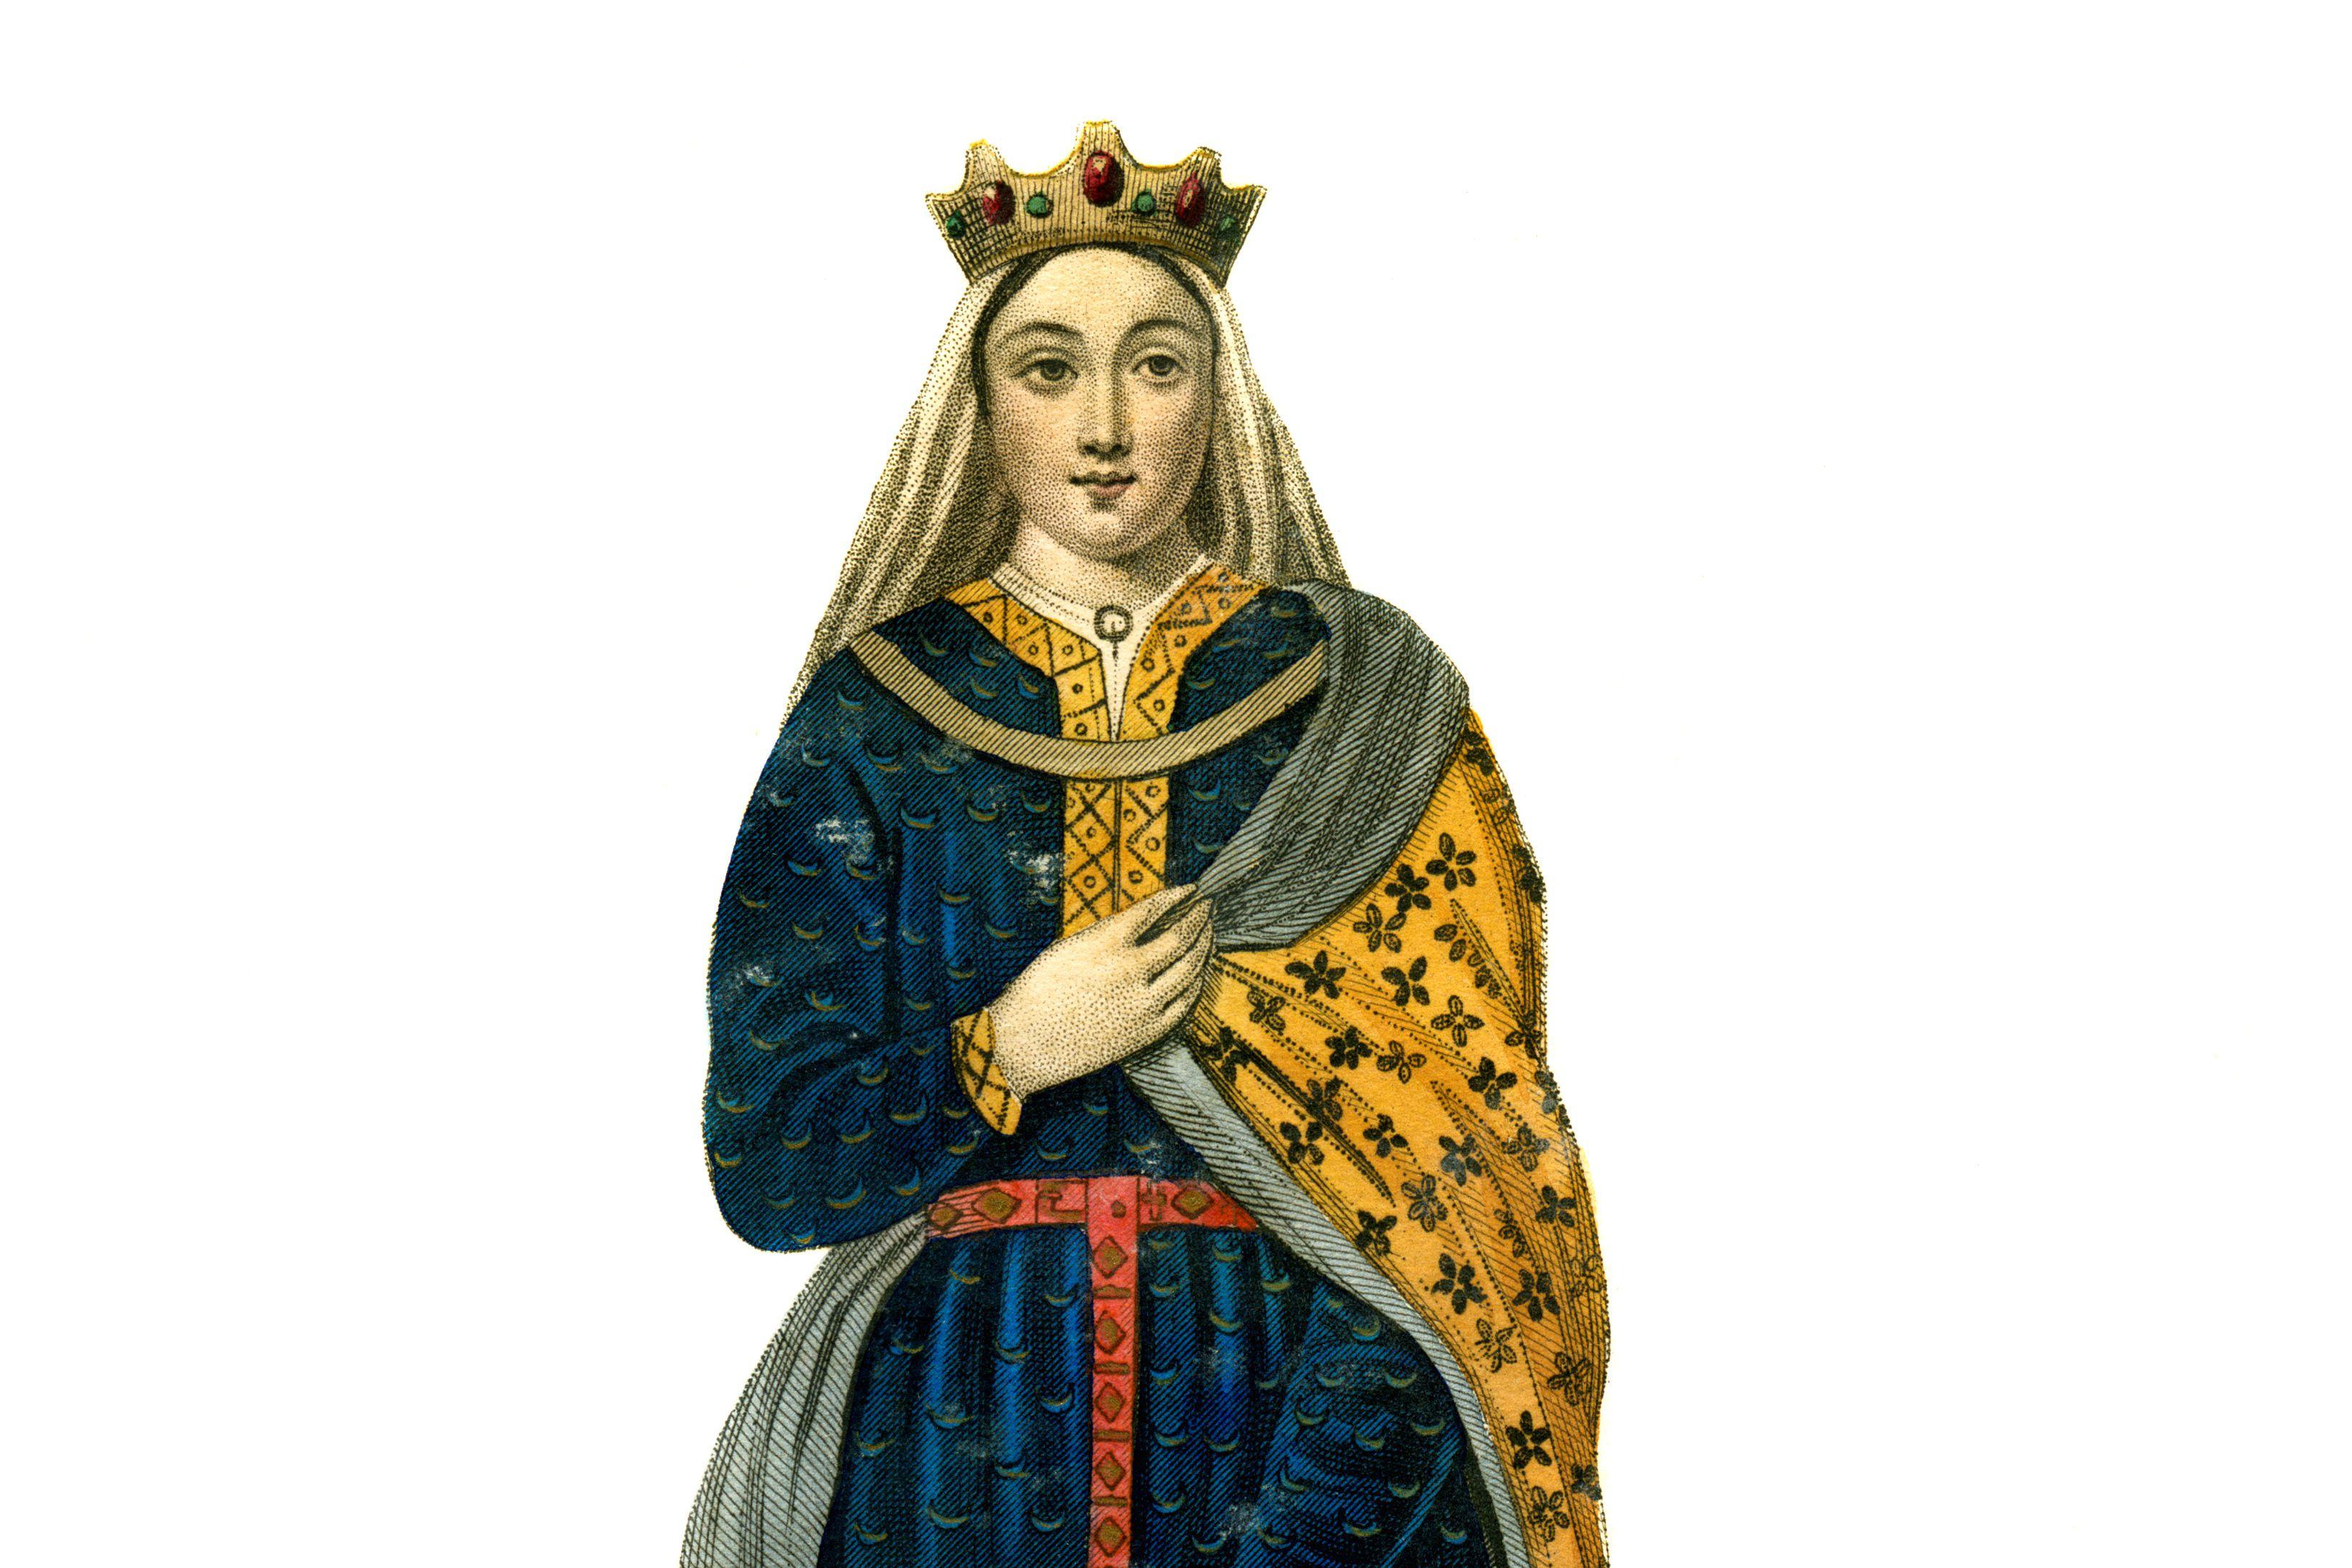 Isabella, Countess of Angouleme